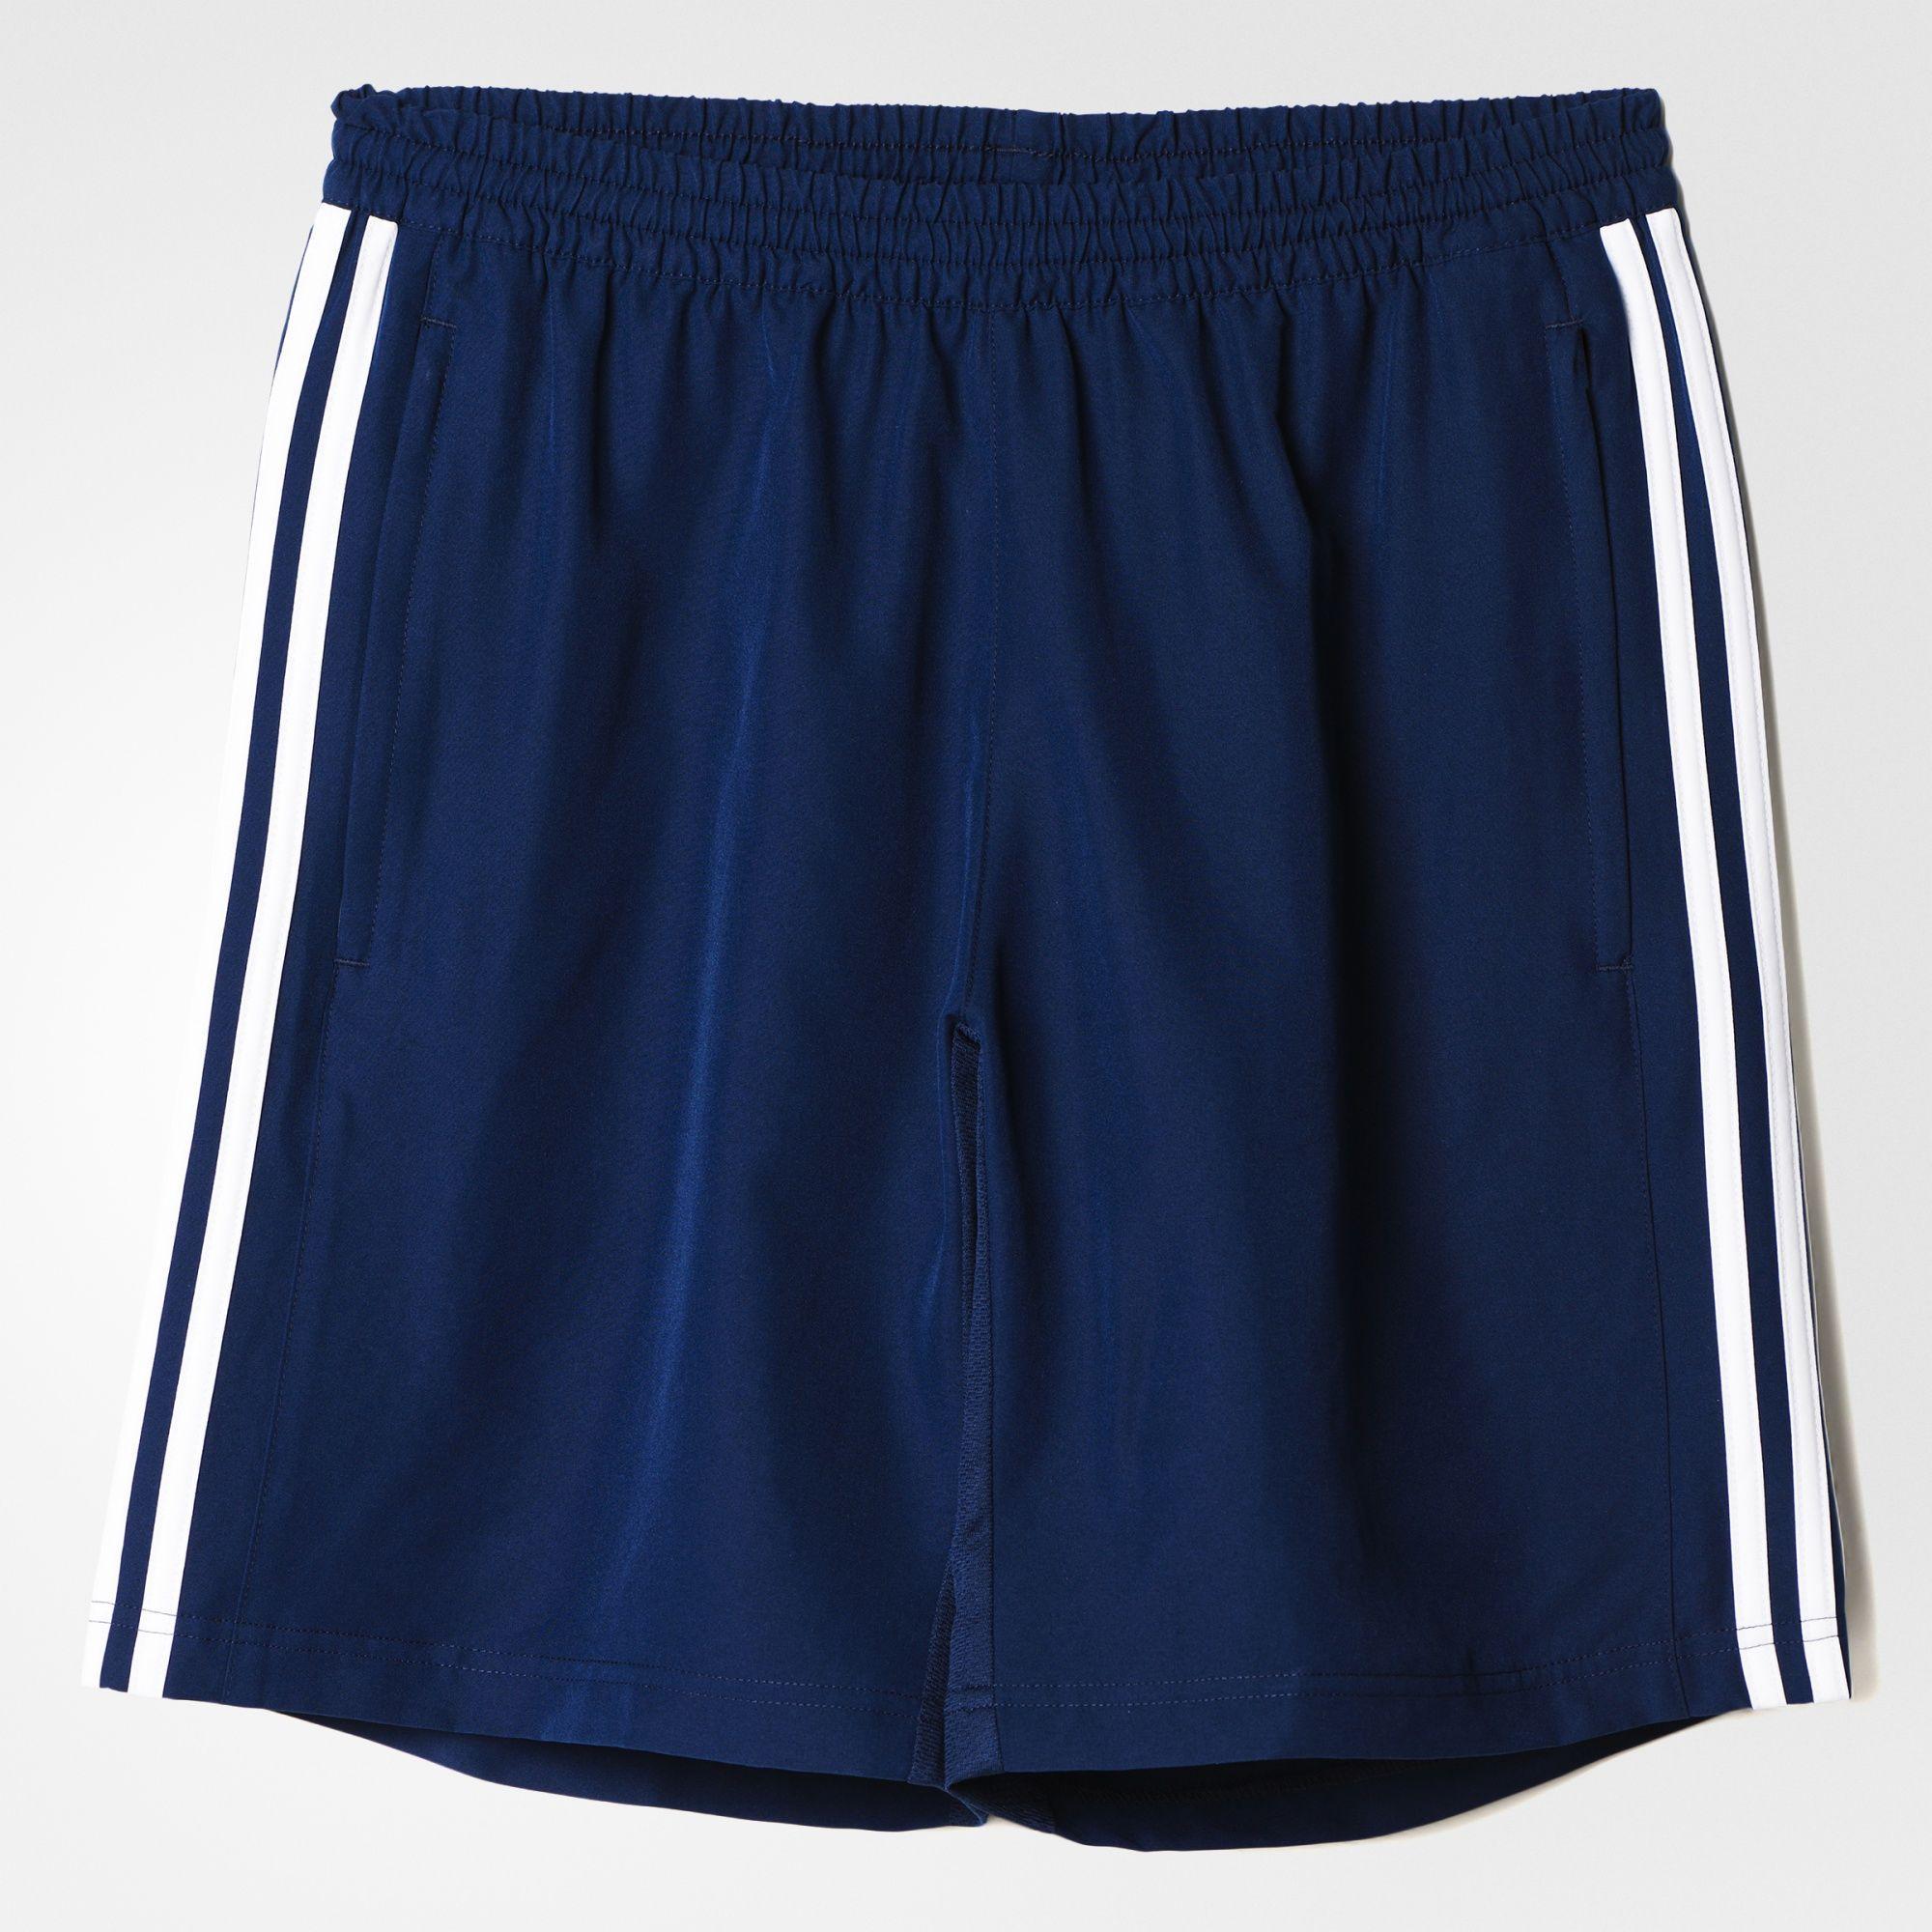 Adidas Mens T16 ClimaCool Shorts - Navy/White